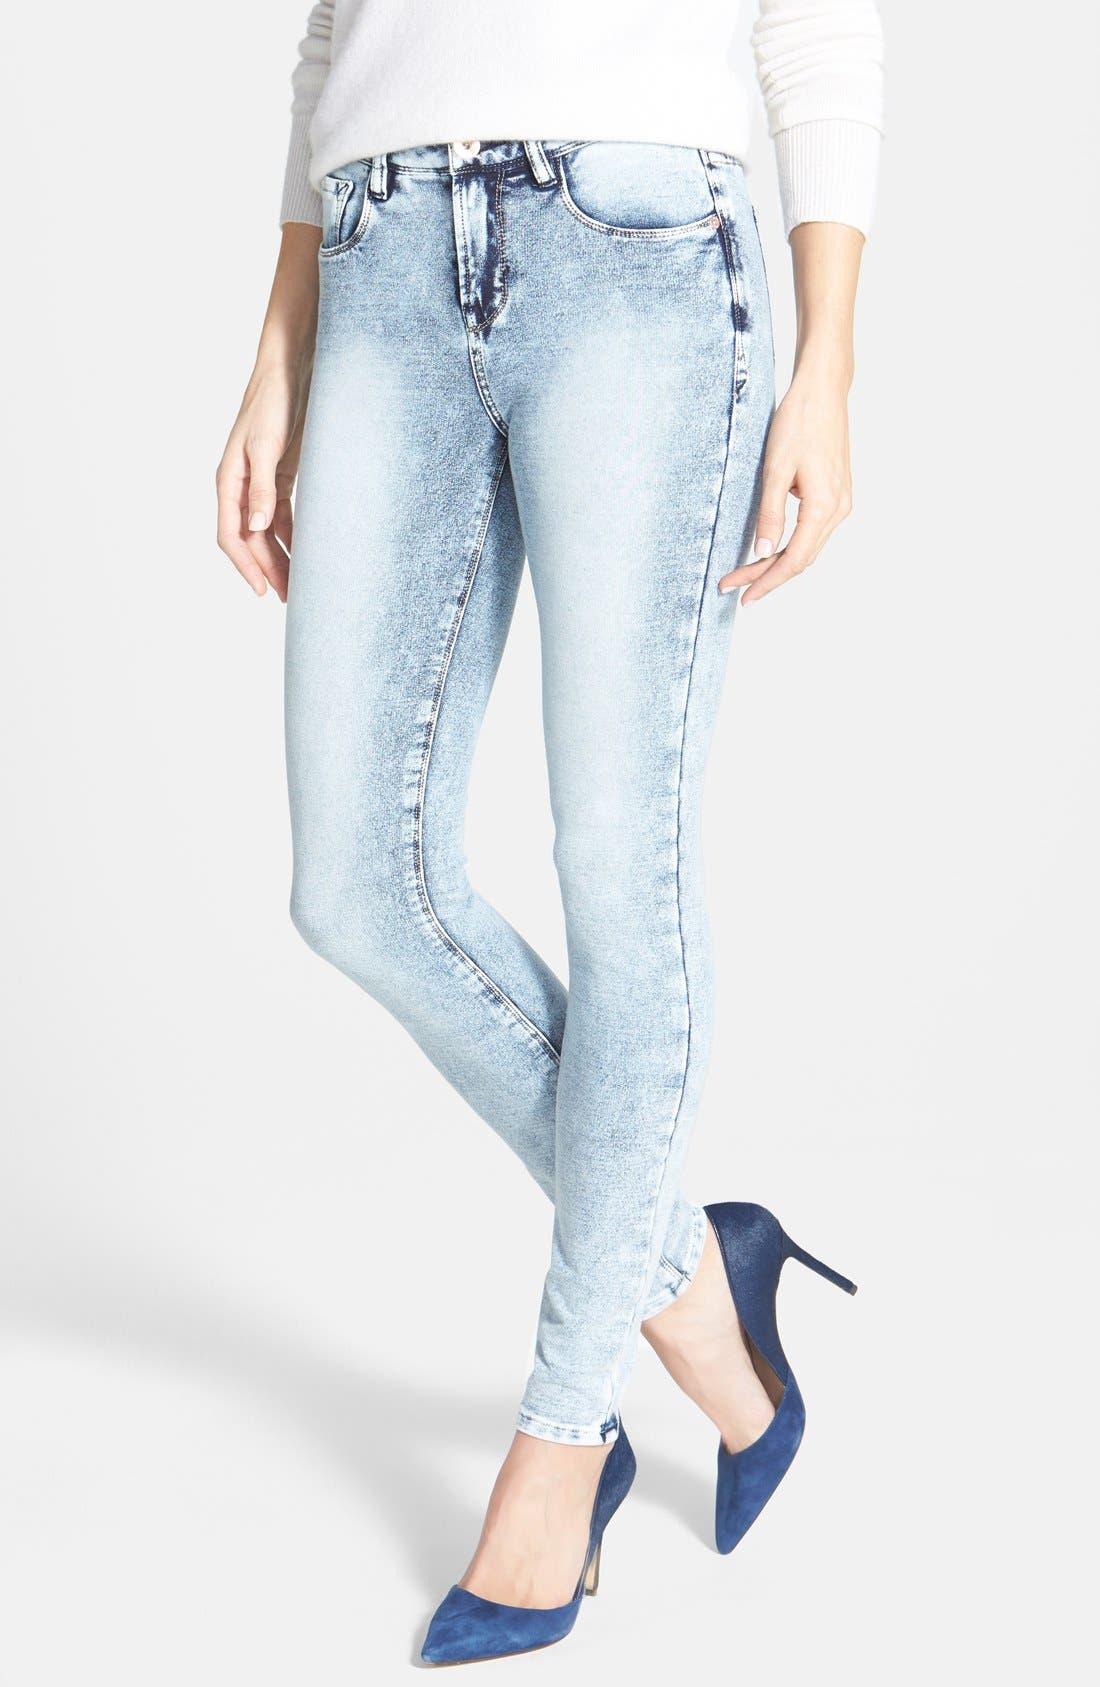 Alternate Image 1 Selected - kensie 'Ankle Biter' Acid Wash French Terry Skinny Jeans (Grey Acid)